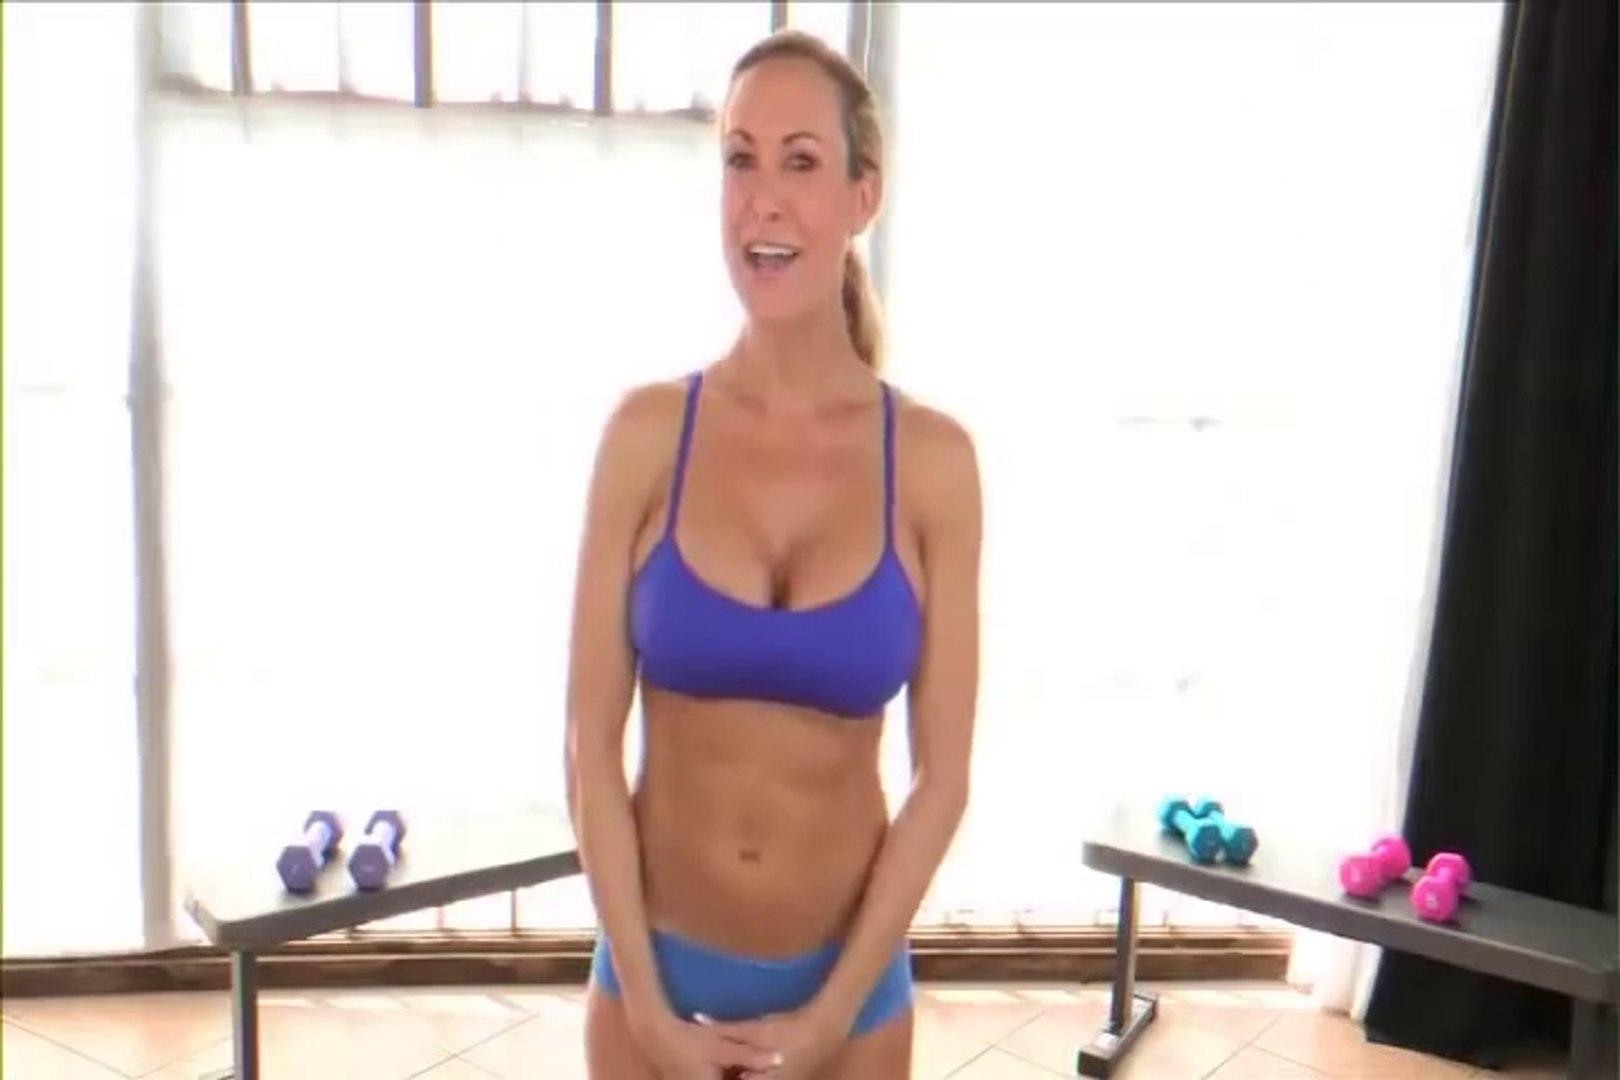 Gym brandi love Hot fitness